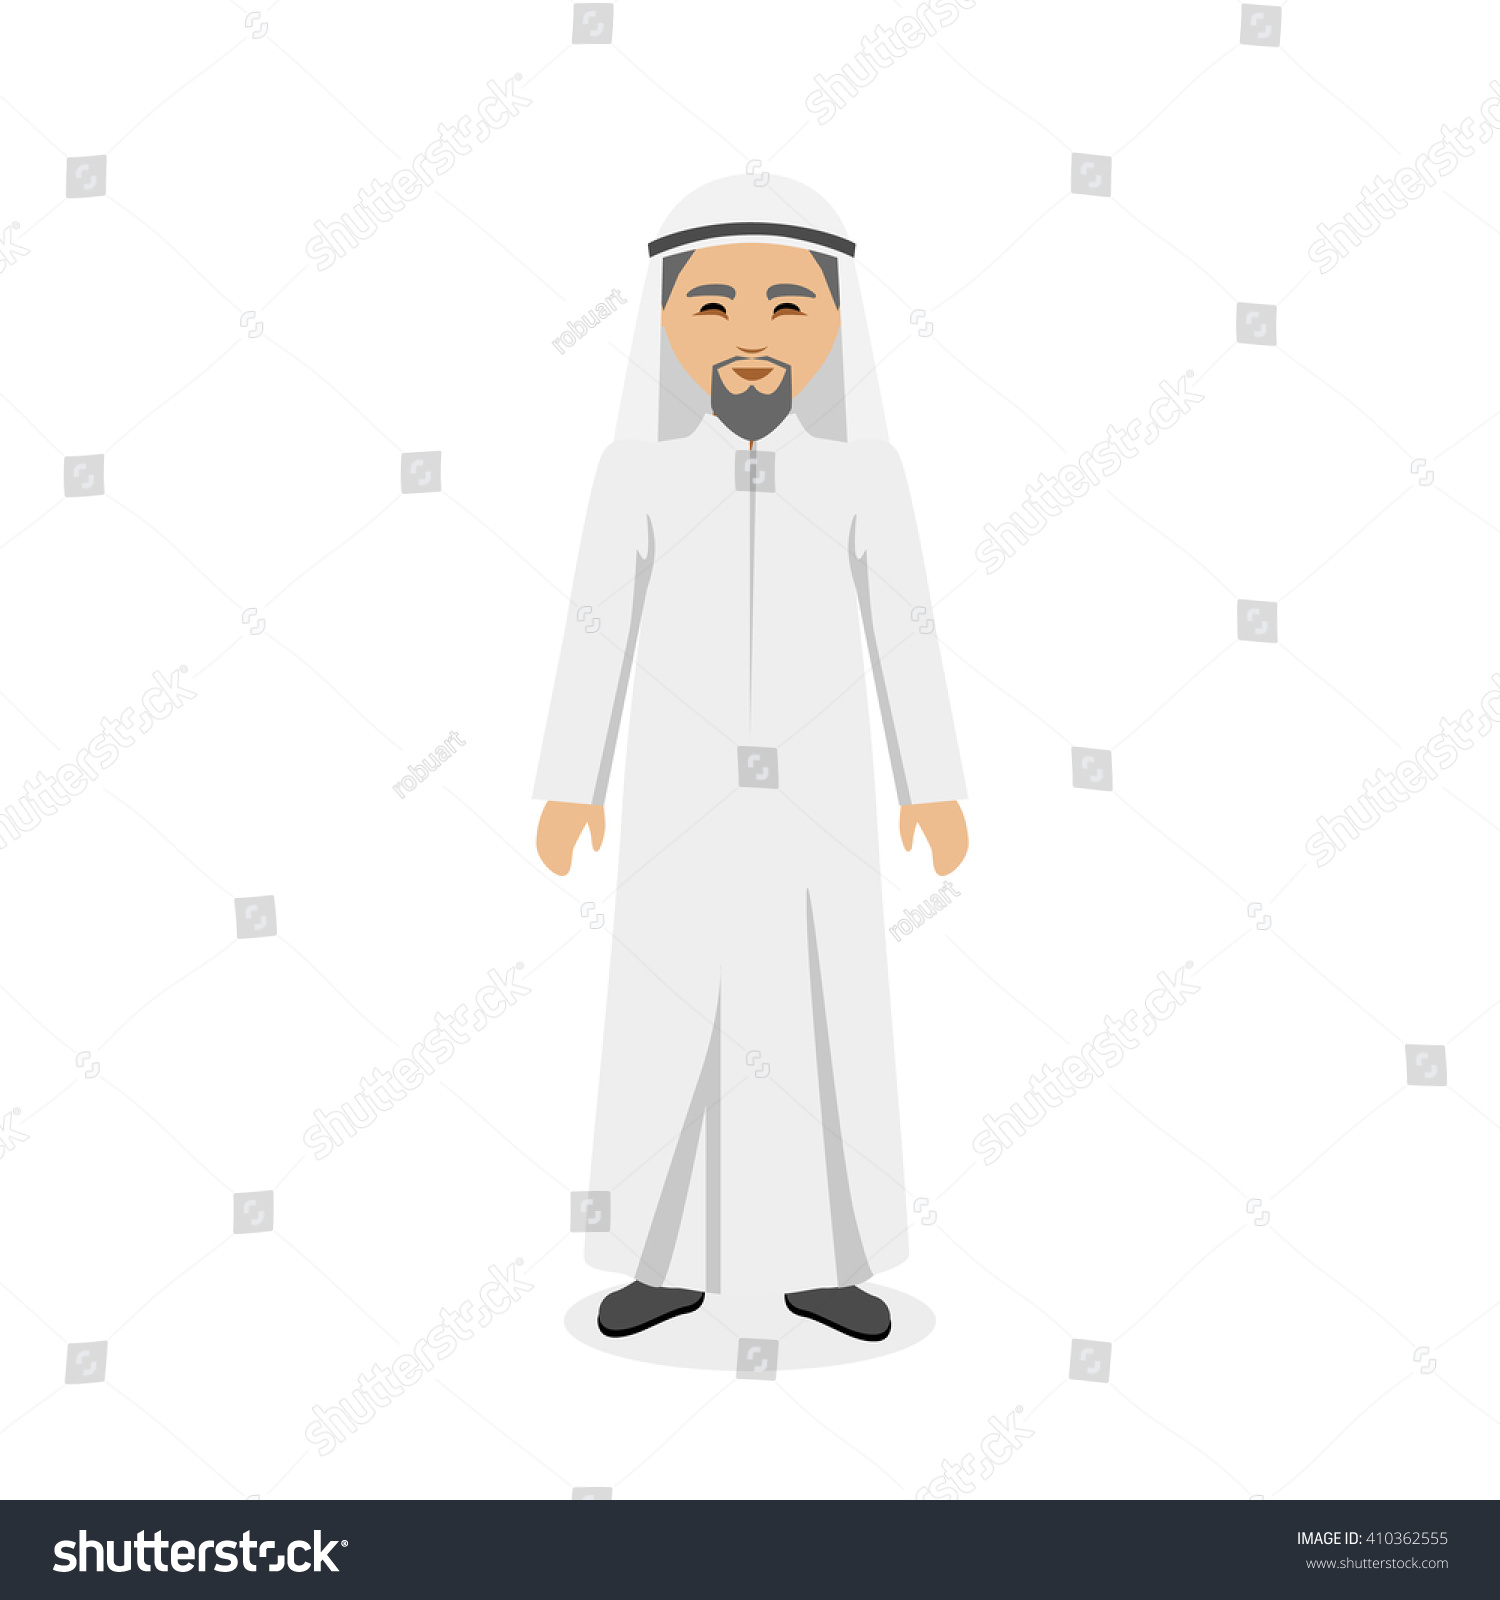 north east muslim single men Arab dating site with arab chat rooms arab women & men meet for muslim dating & arab matchmaking & muslim chat.